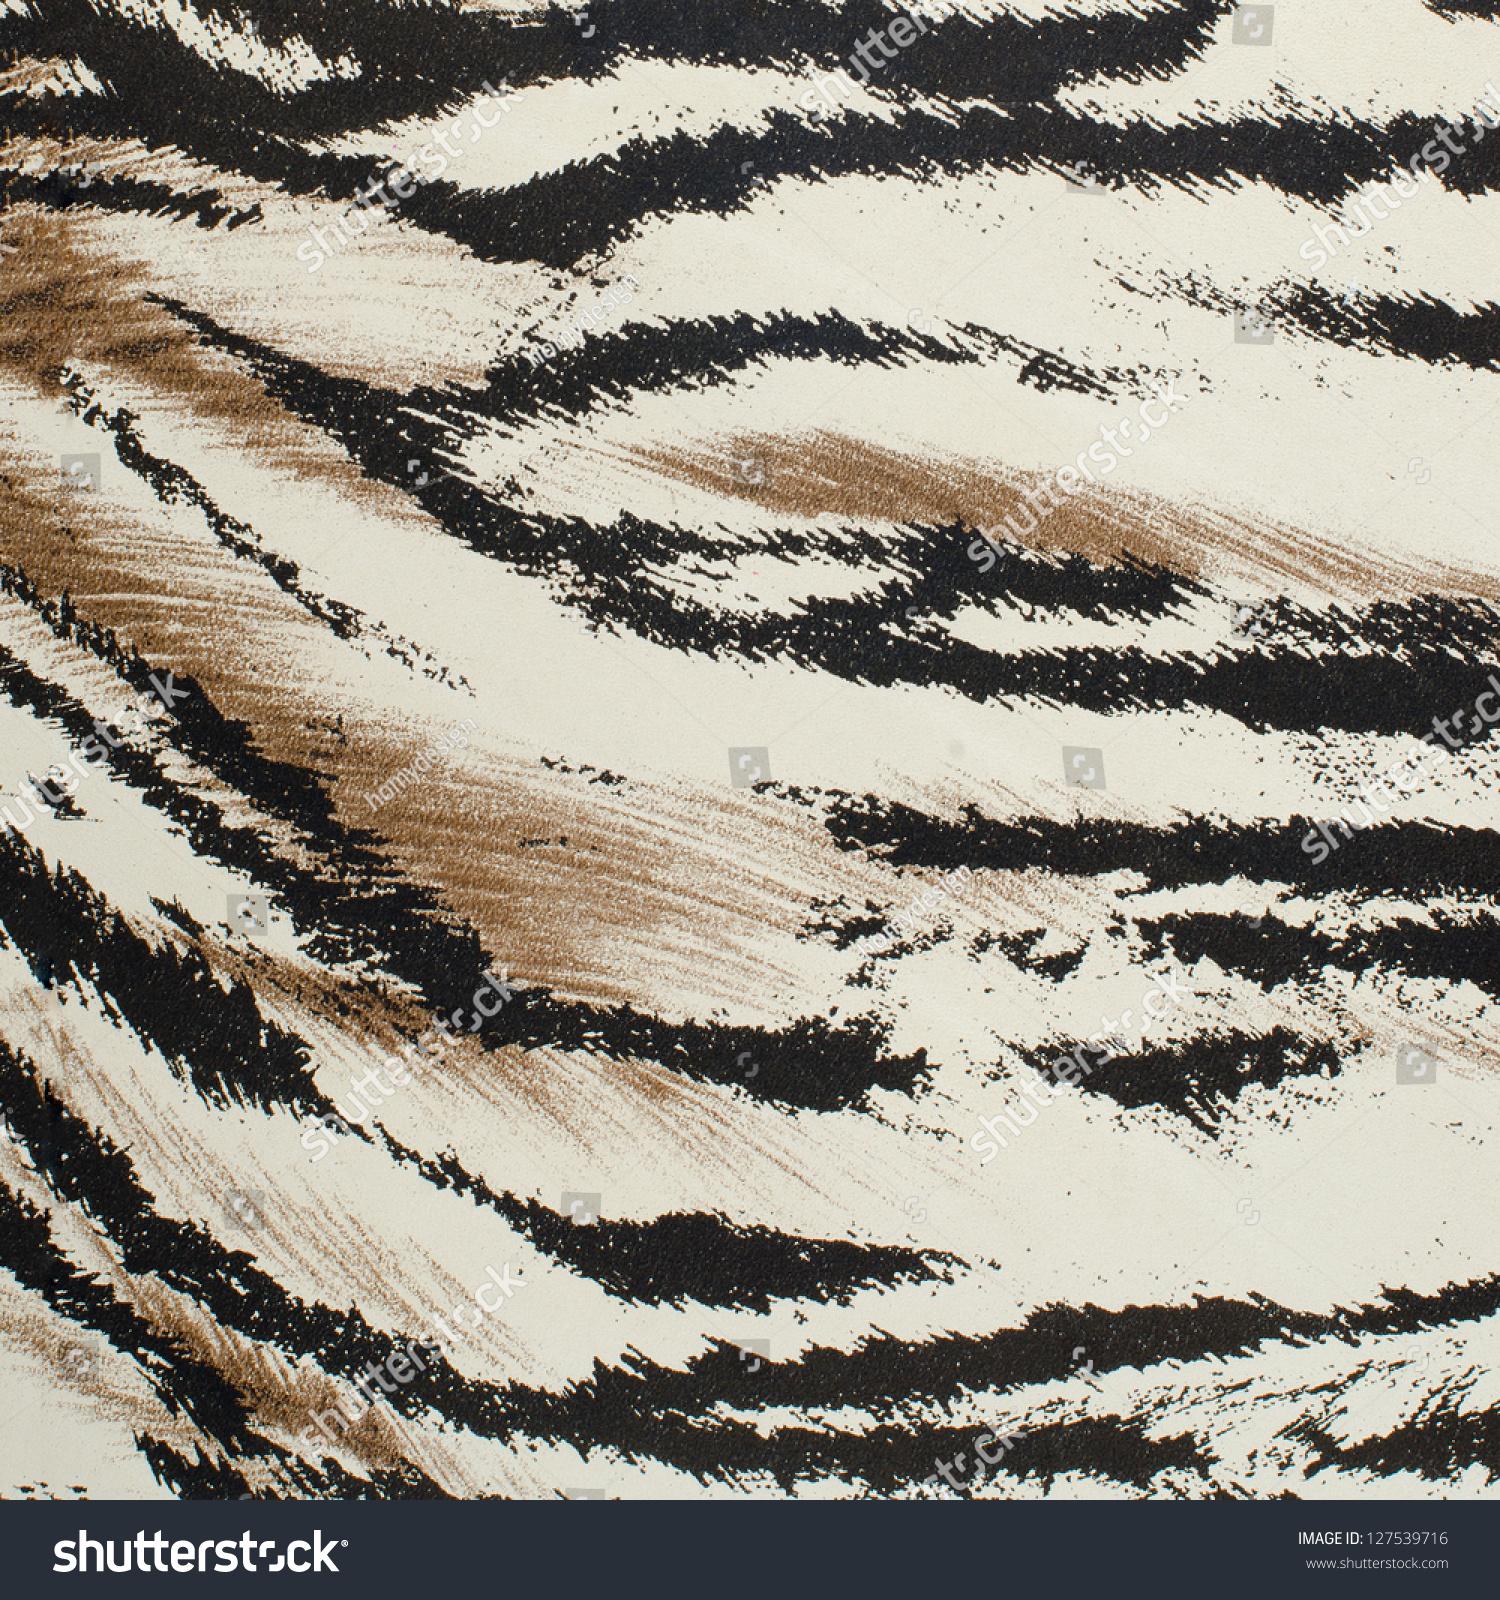 white tiger skin background - photo #12